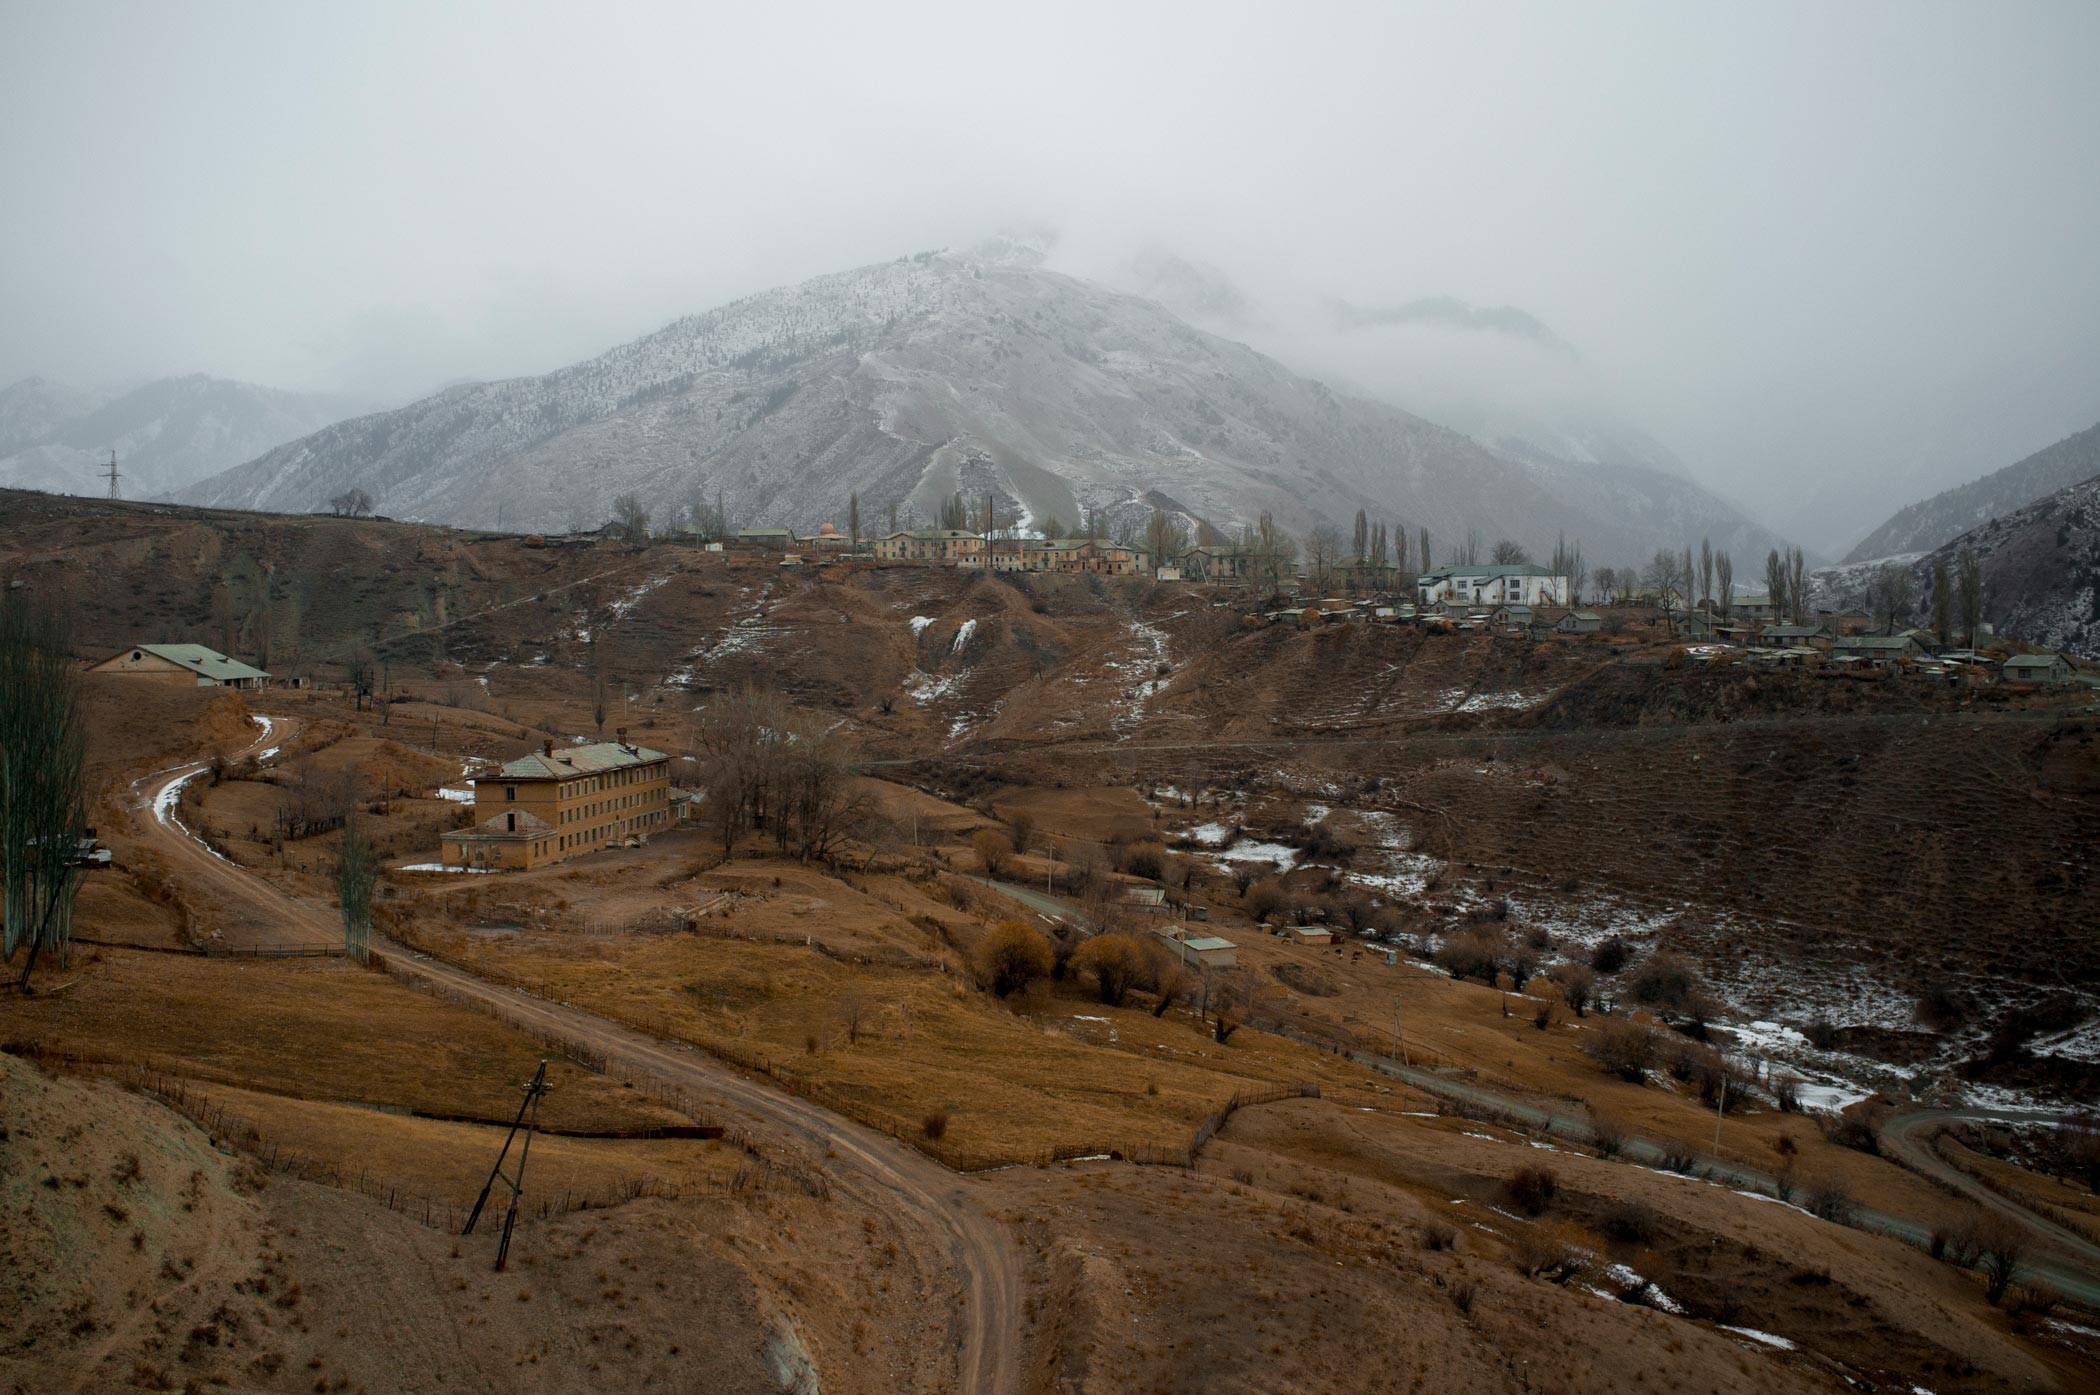 Brown fields overlooking Min Kush in Kyrgyzstan